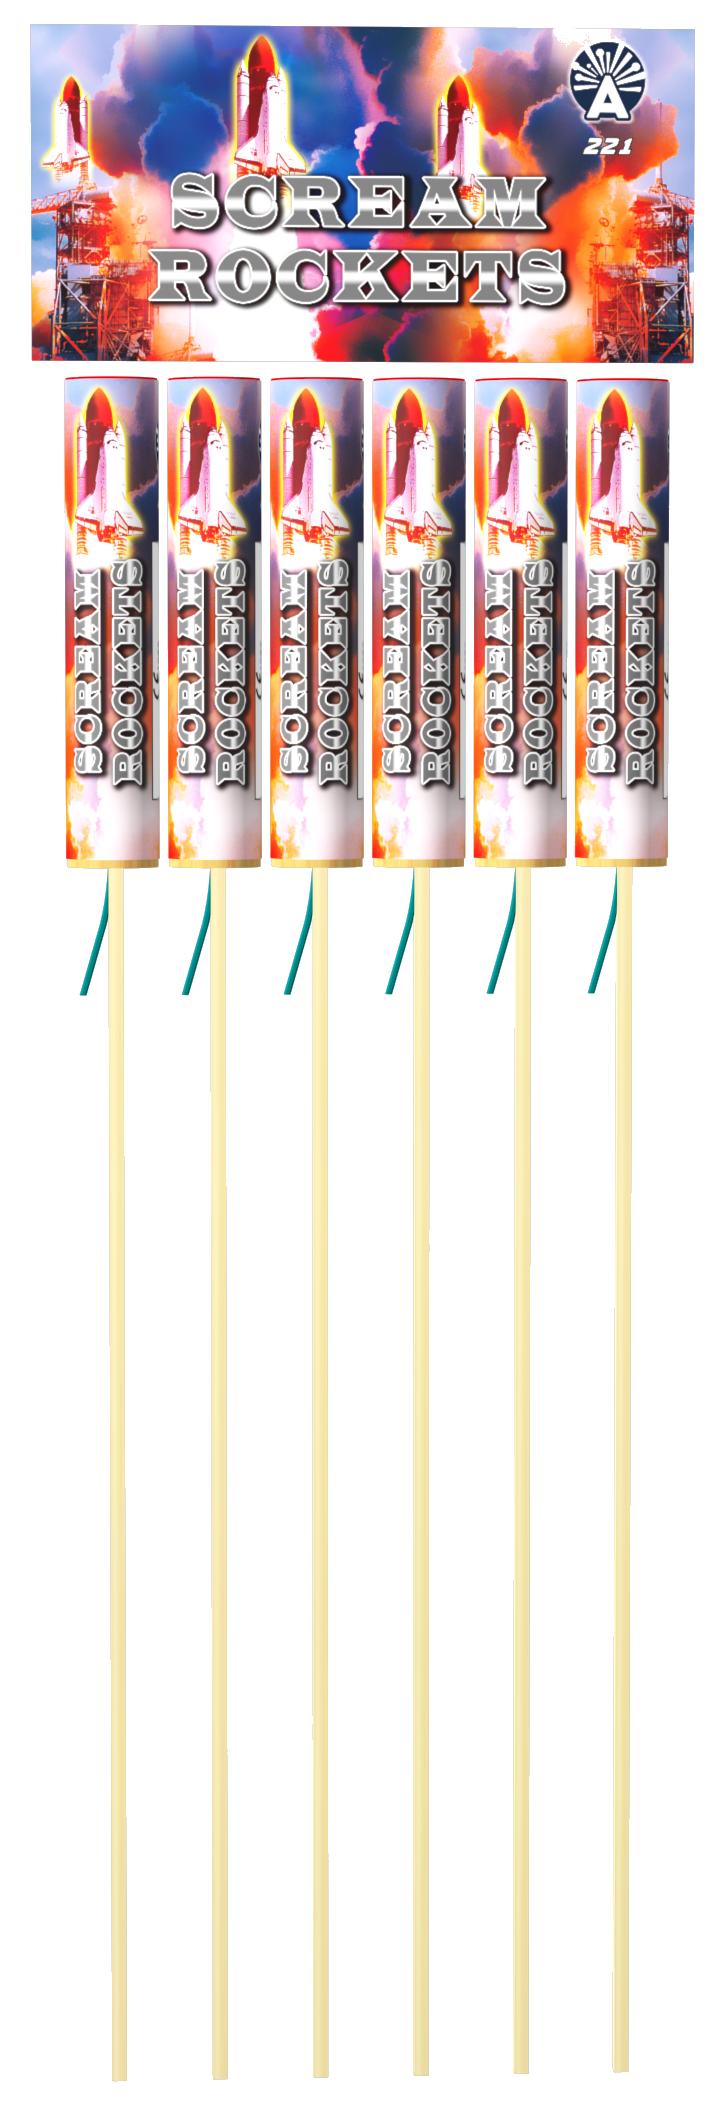 Scream Rockets (6 stuks)